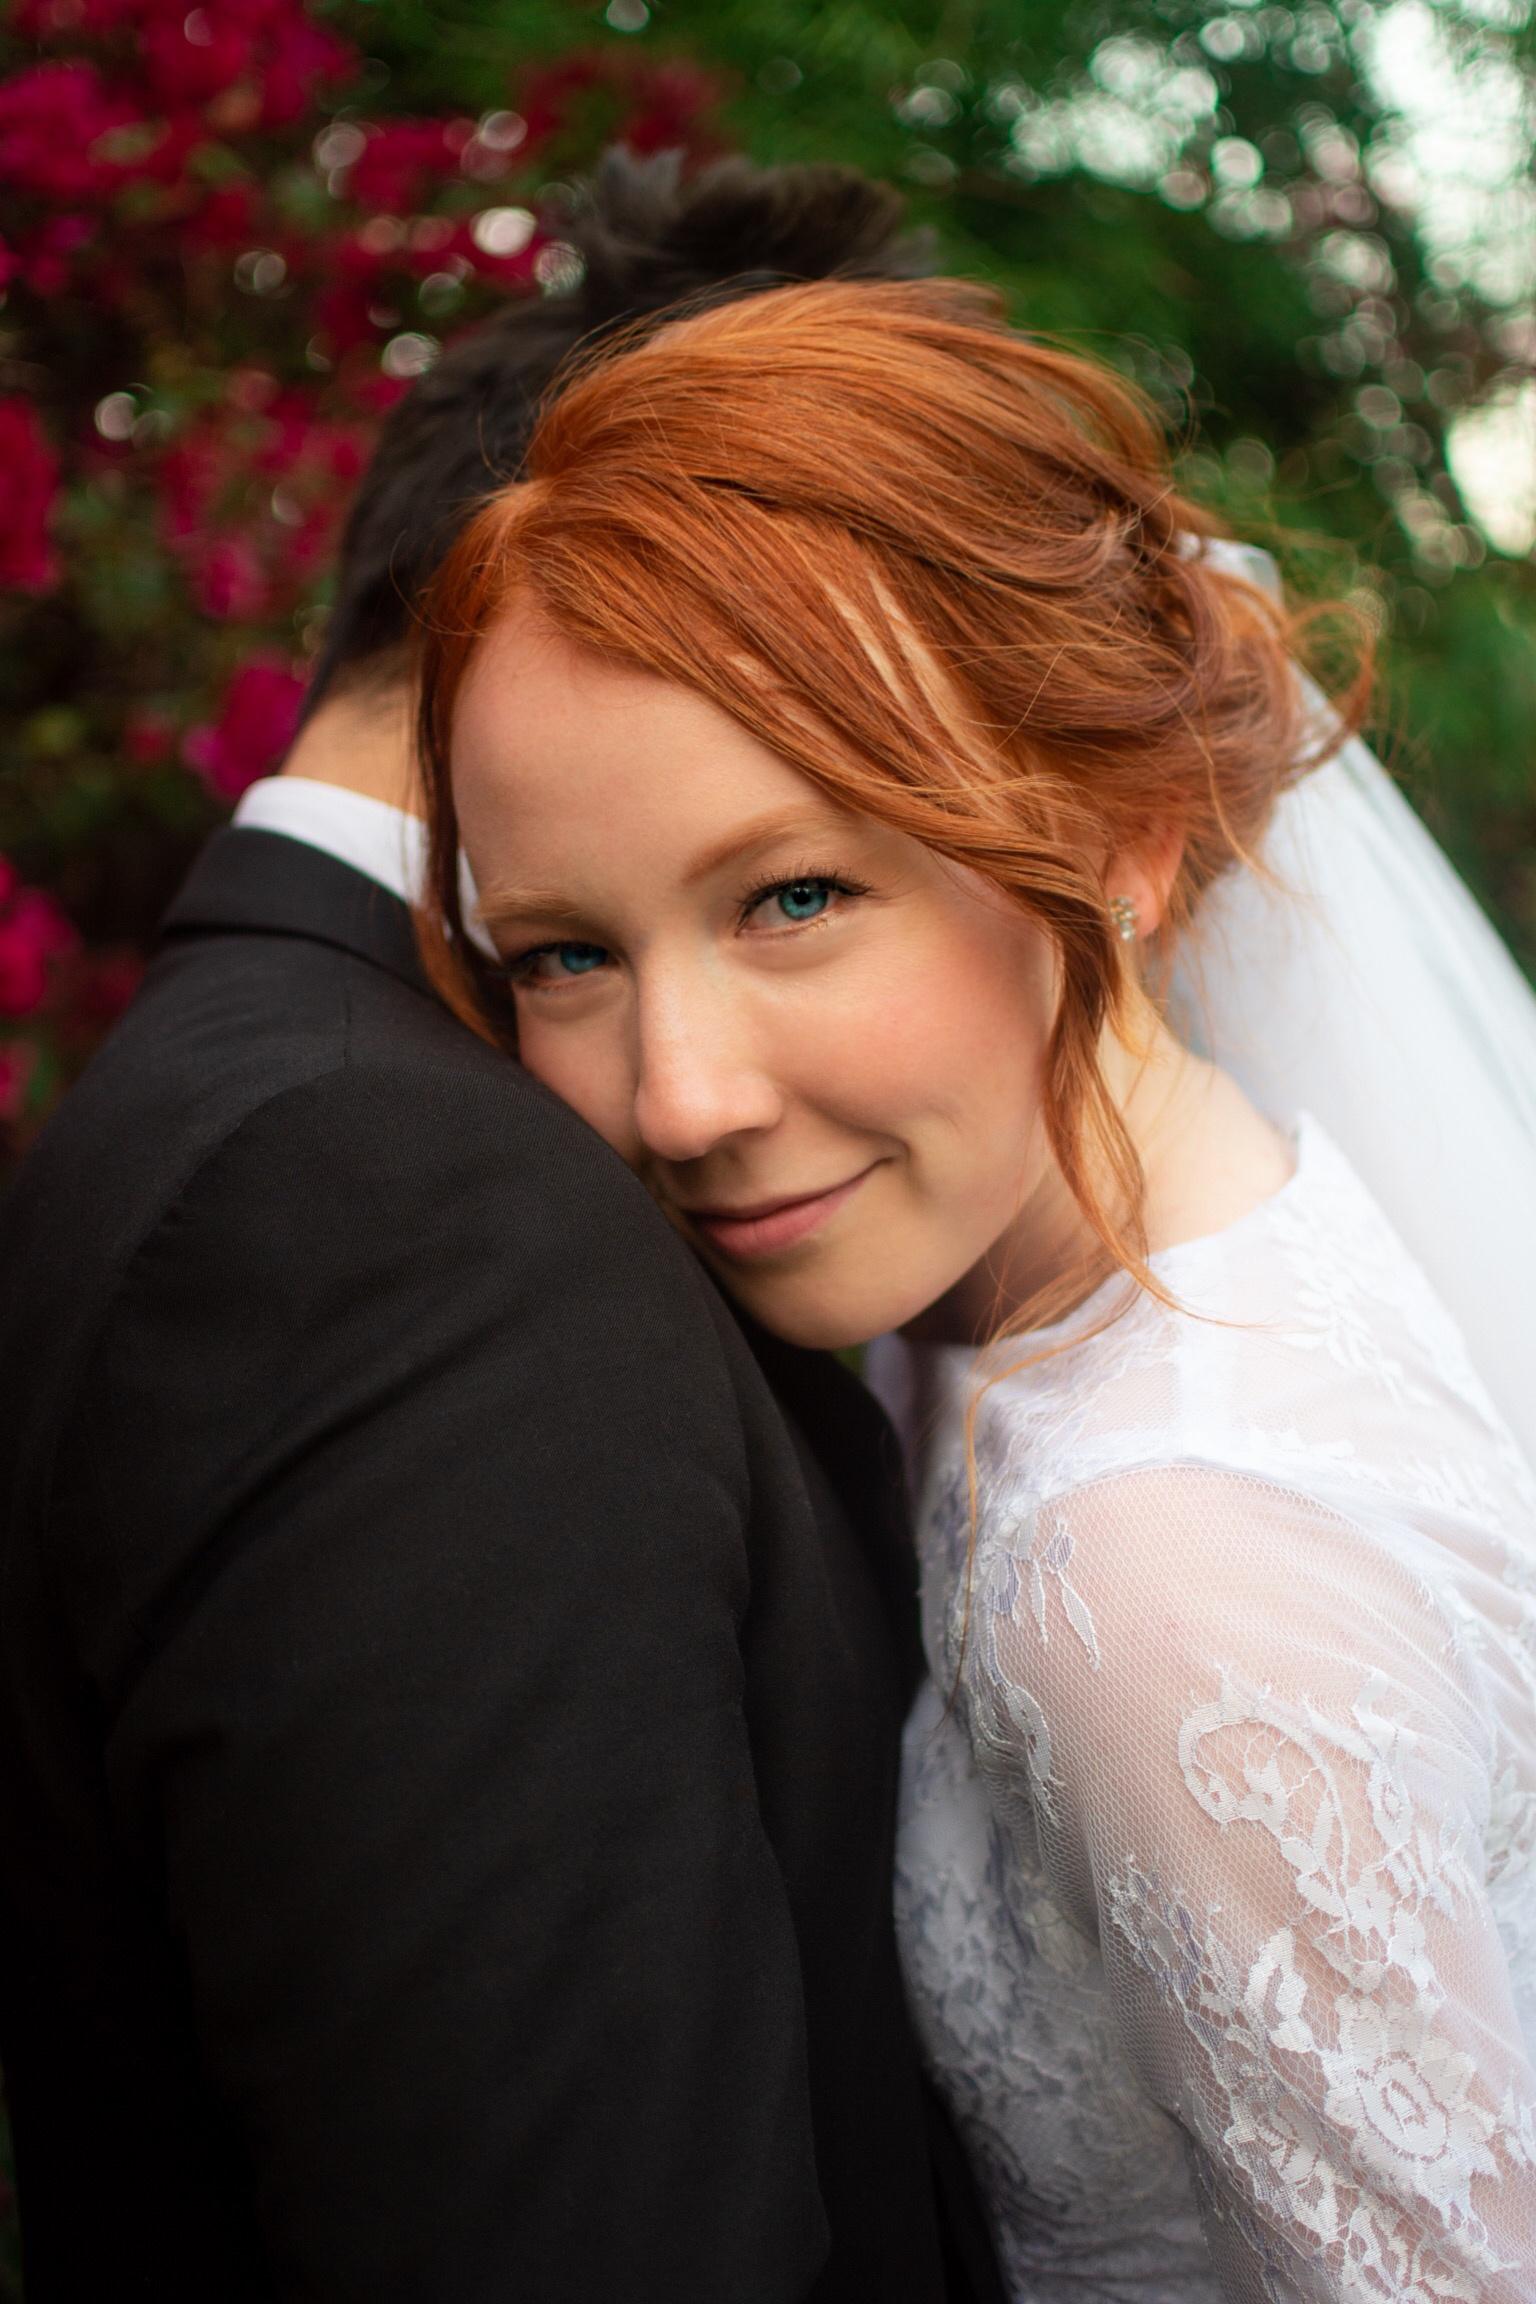 Bridal Hair and Makeup Artist in LA